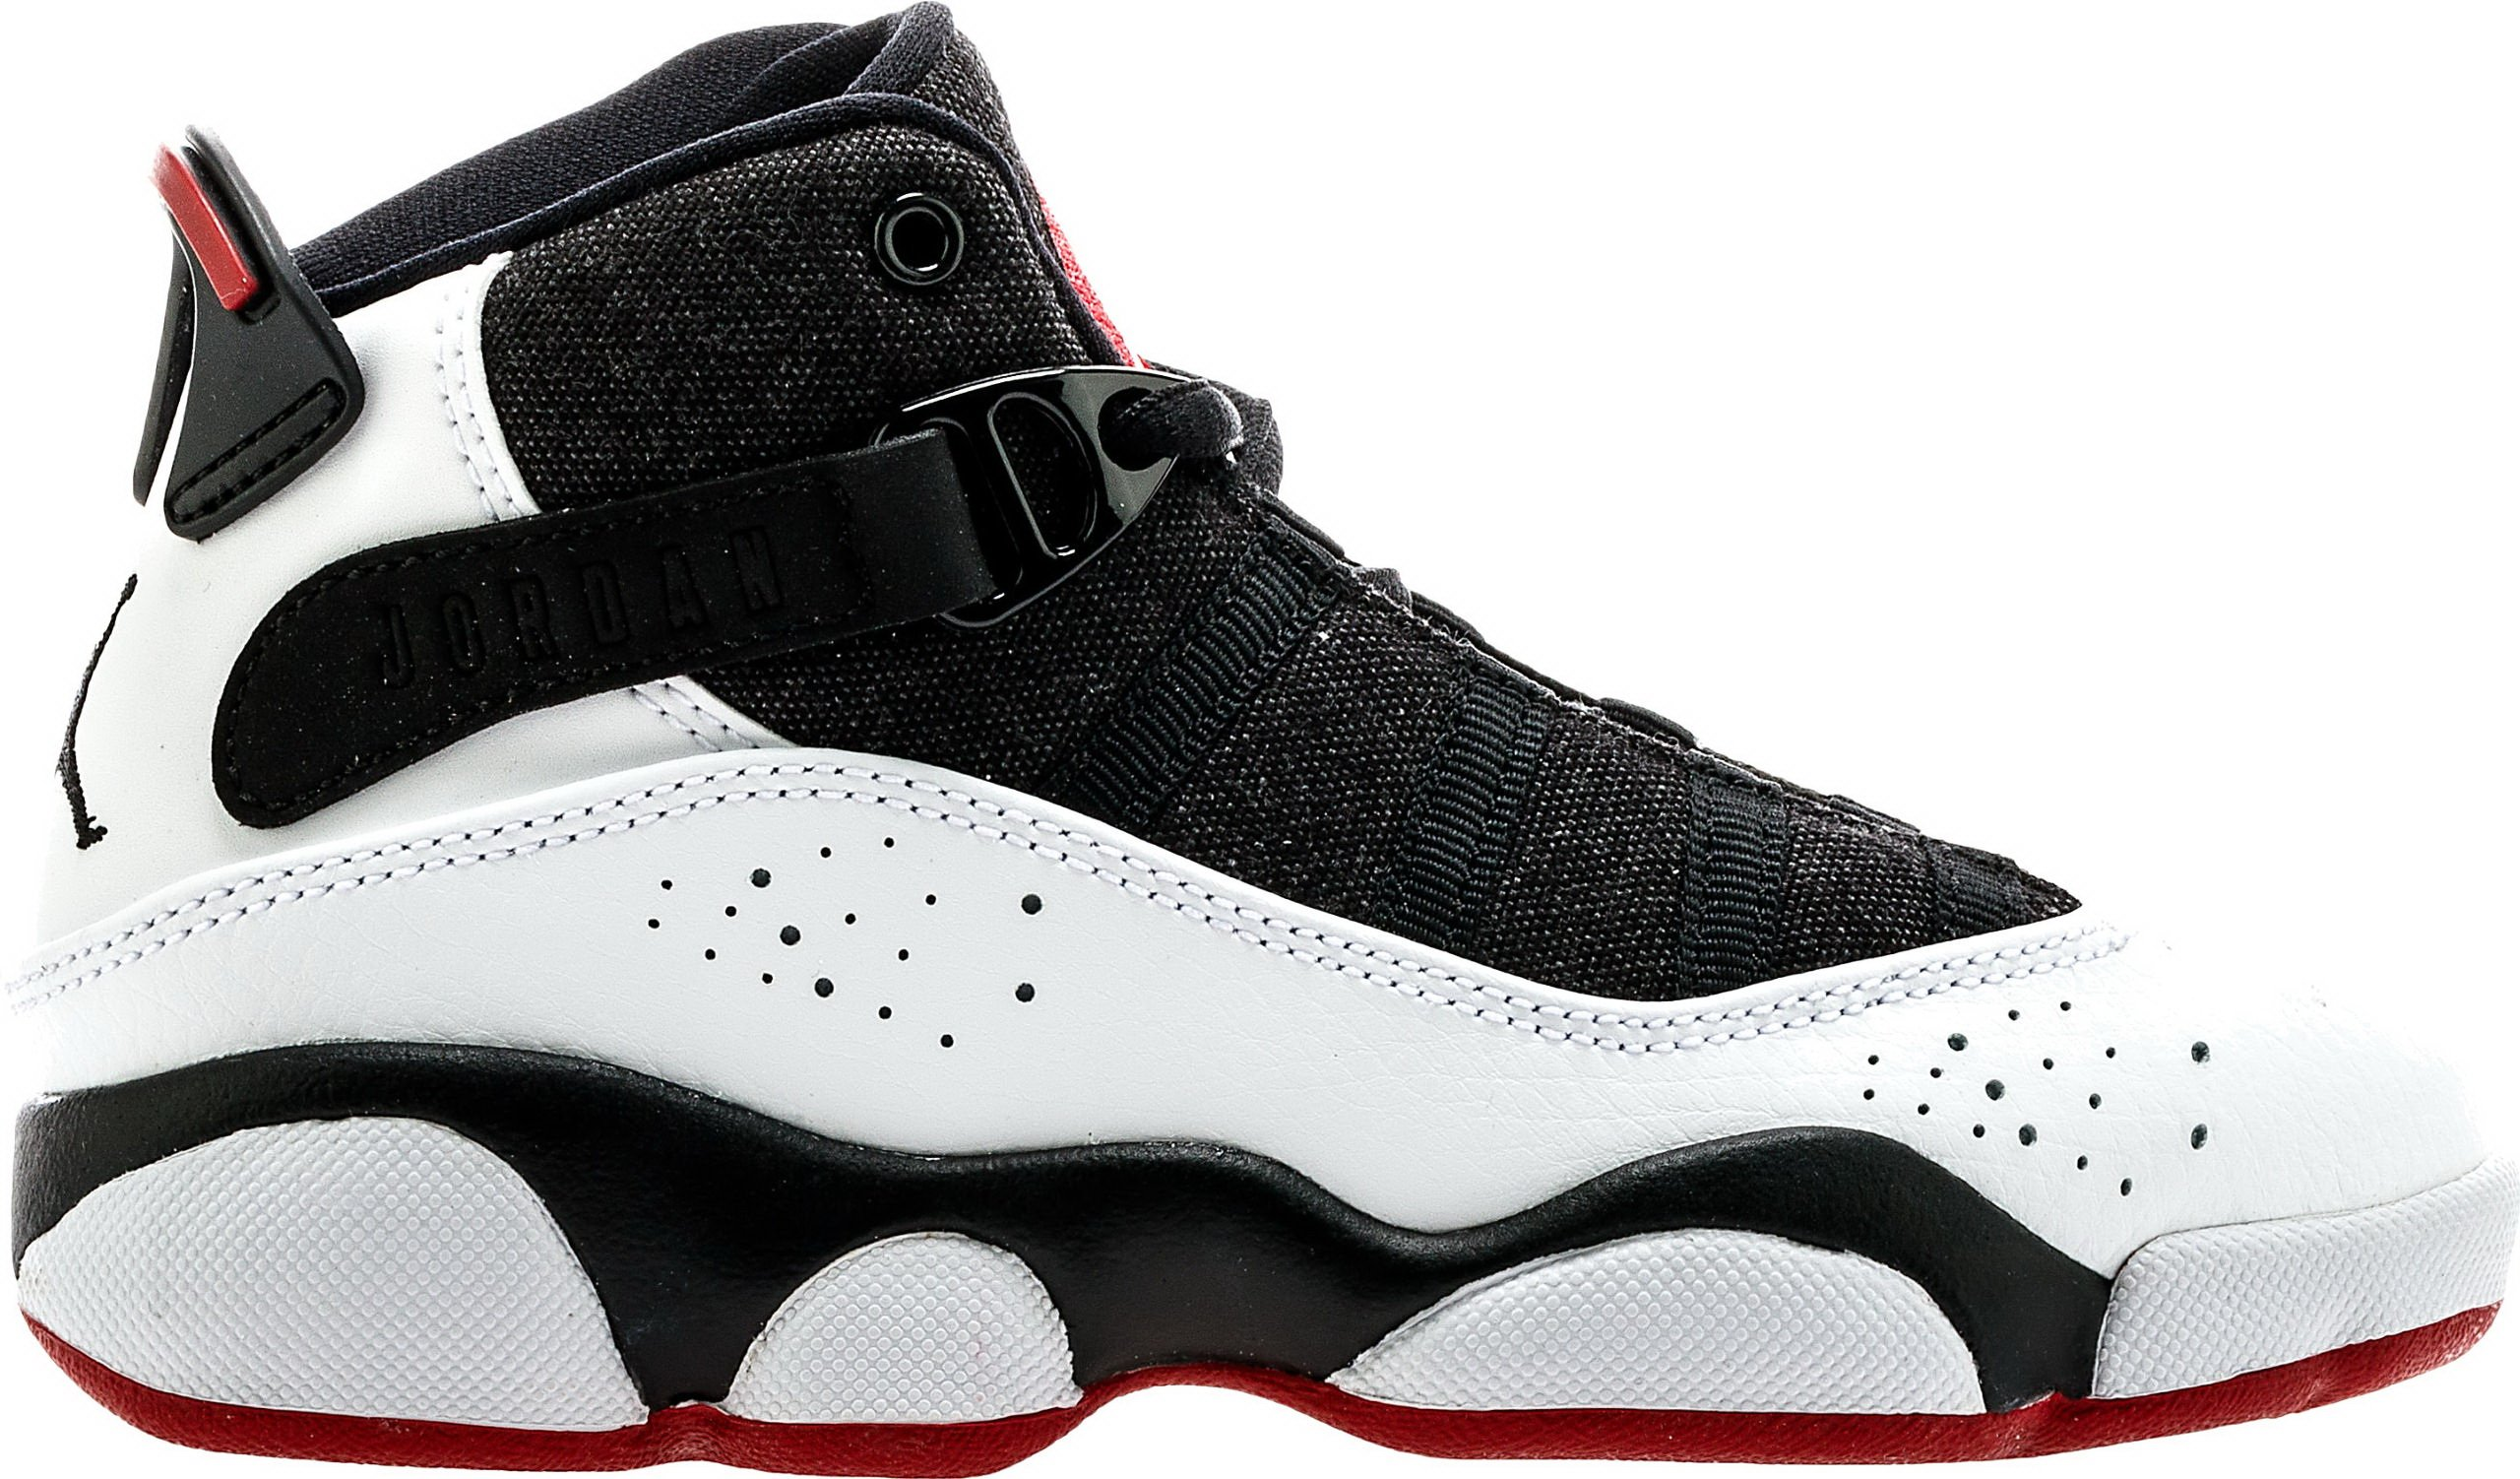 Jordan 323432-012 Air Jordan 6 Rings Preschool Basketball Shoe …